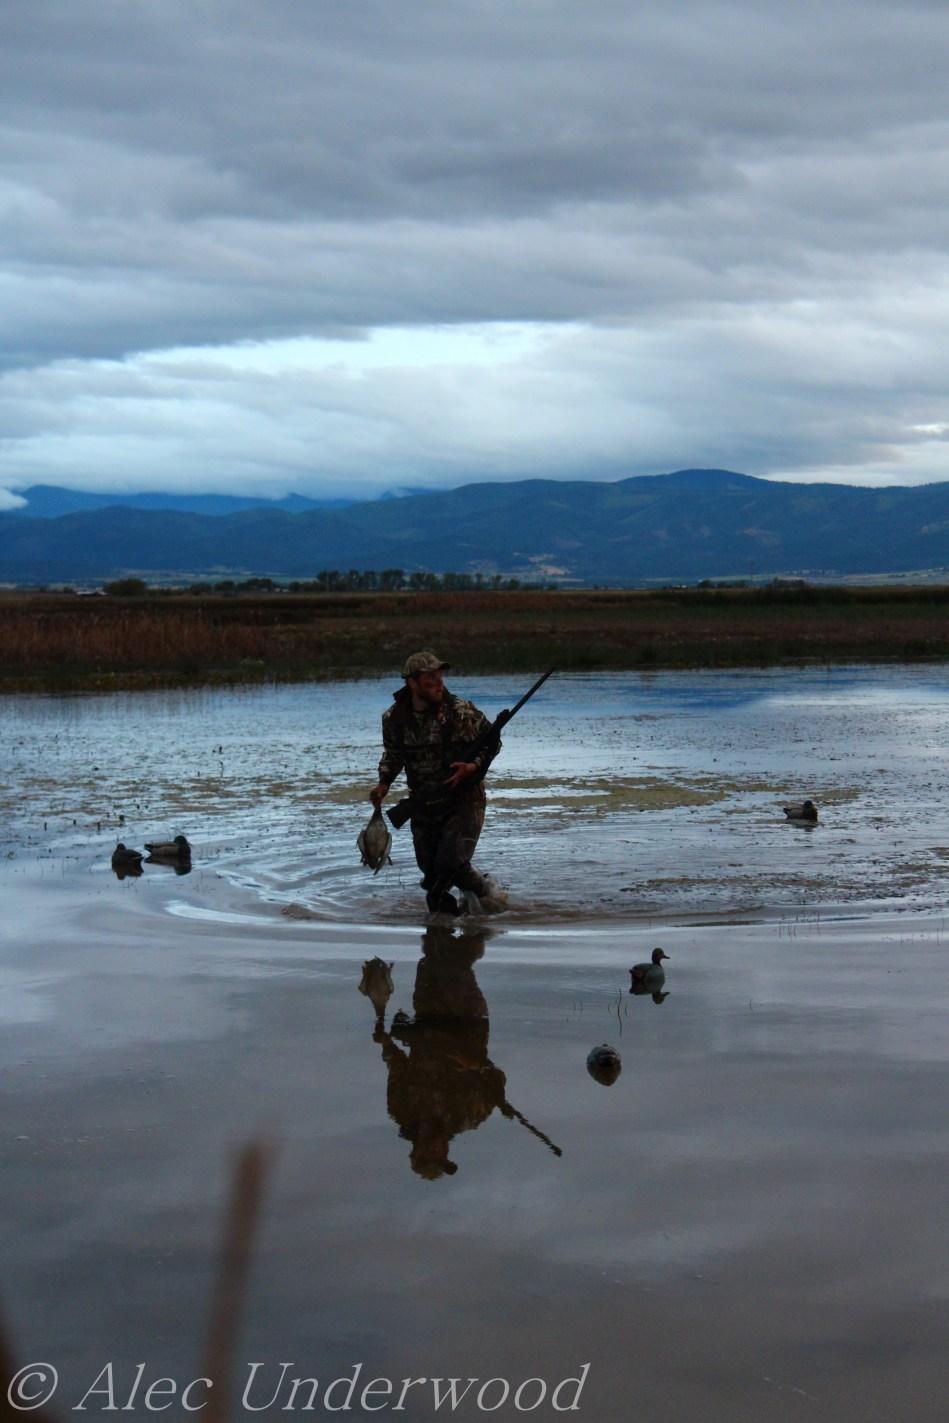 Retrieving the duck